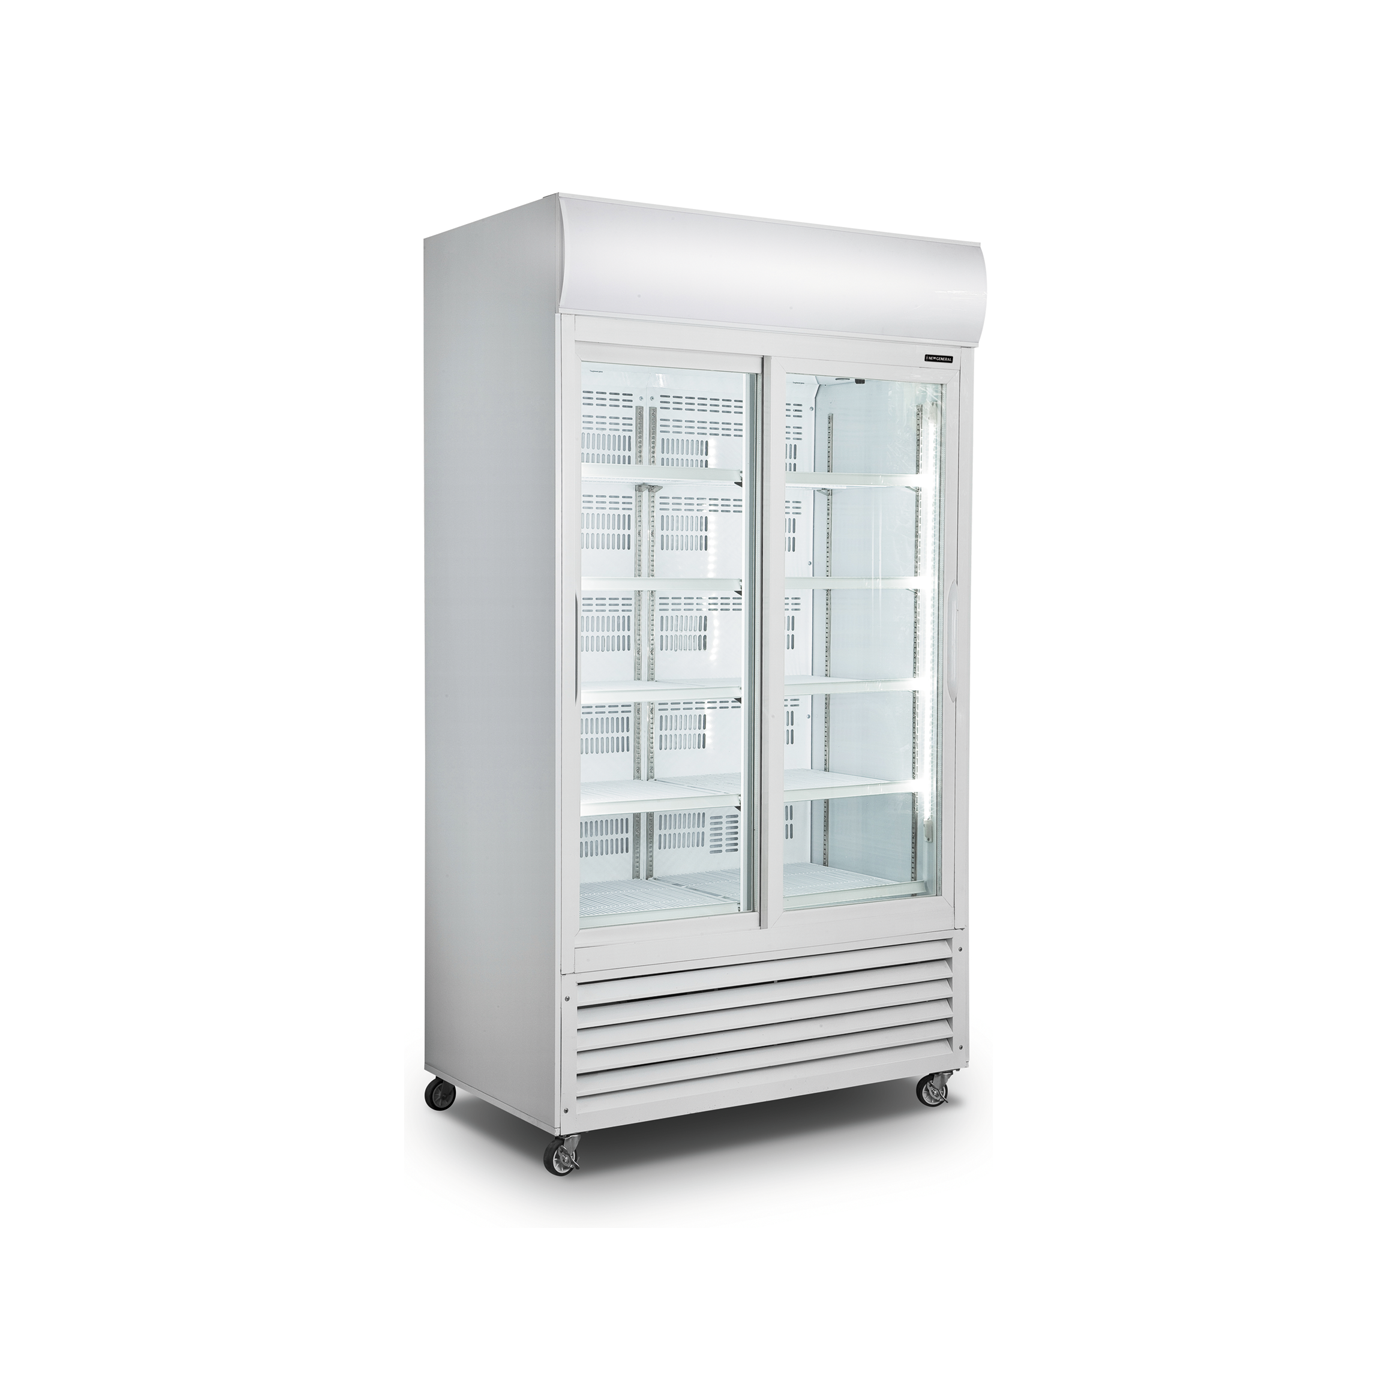 New General Upright Display Cooler Tropicalized 2 Door Dynamic Cooling Ventilated Fan Cooling No Fr Sliding Shelves Locker Storage Household Electronics